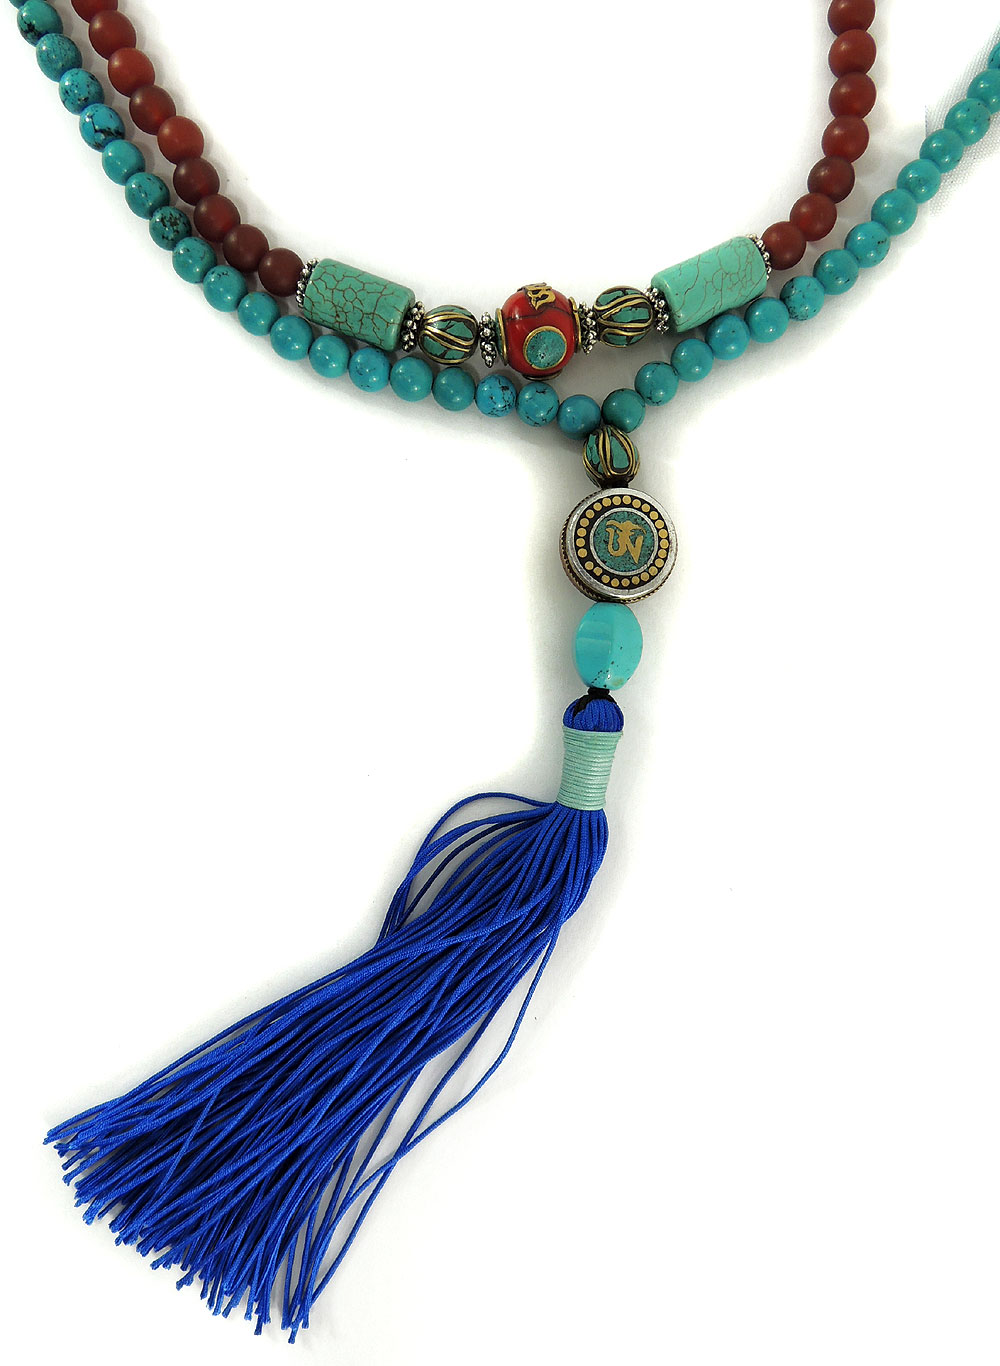 Tibetan Necklace Turquoise Mala Carnelian Prayer Beads 43 Inch by